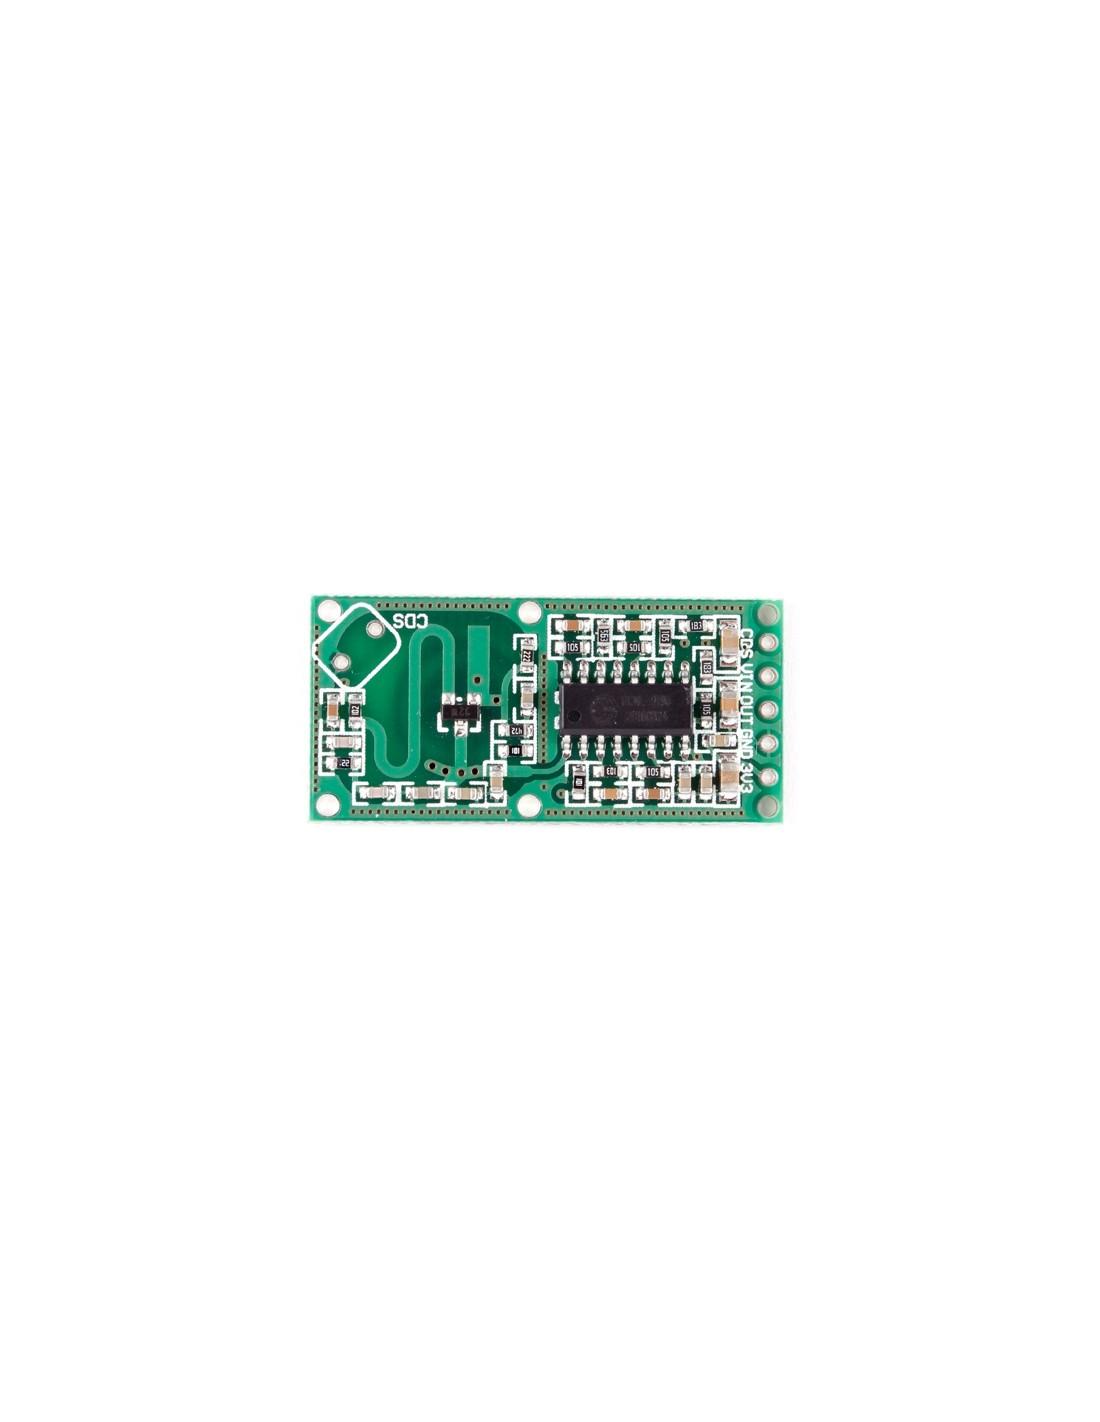 RCWL 0516 Microwave Motion Sensor Module Radar Sensor Body Induction Module  4-28V 100mA